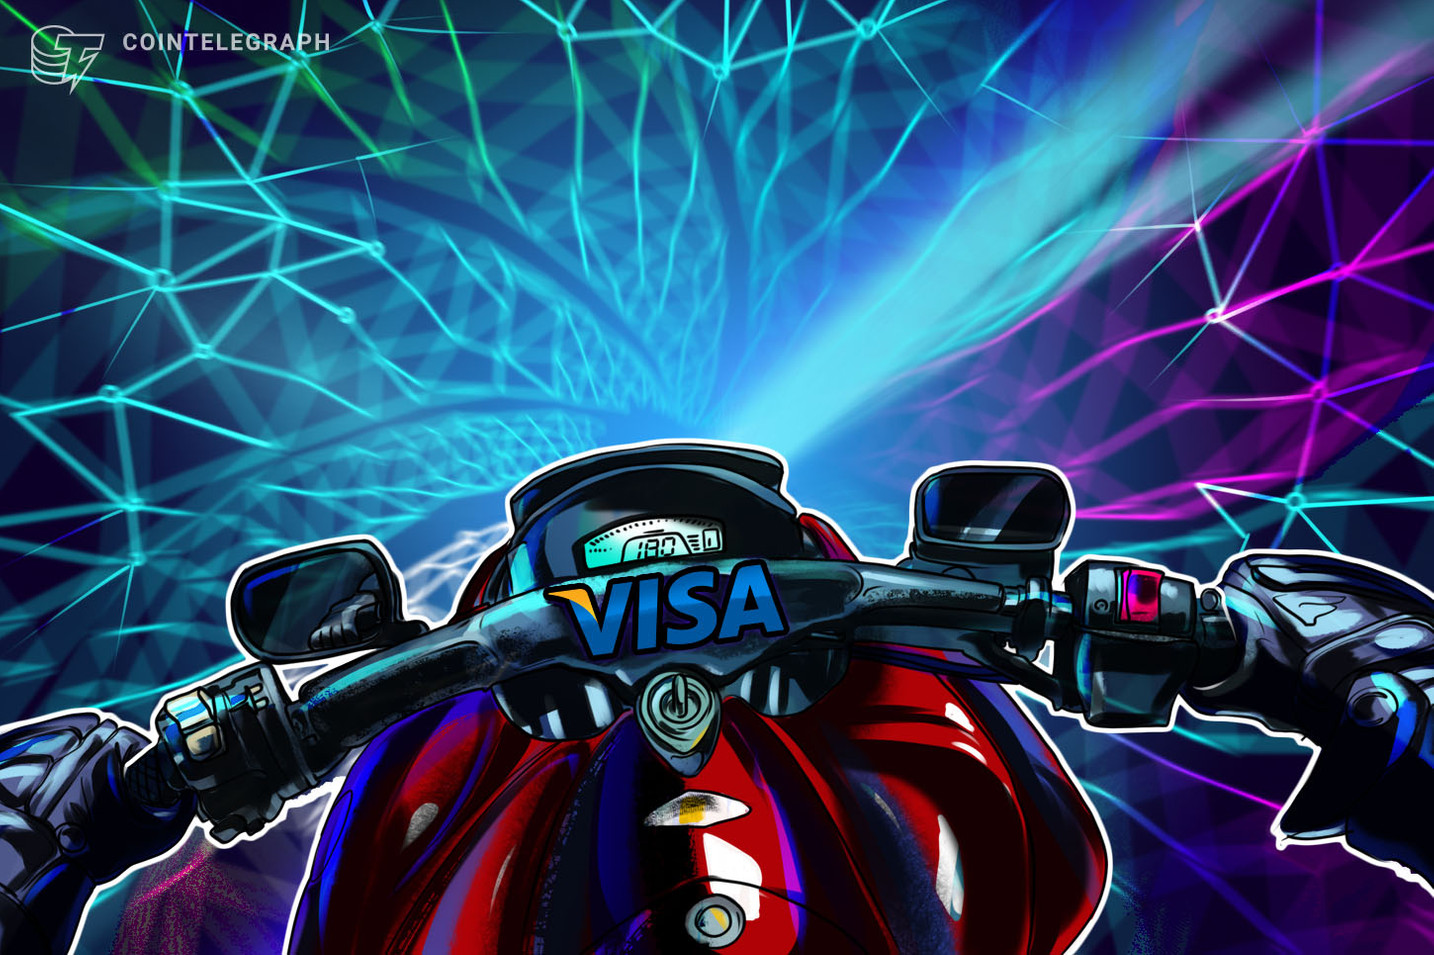 Visa Launches Global Cross-Border Network Based on Certain Aspects of Blockchain